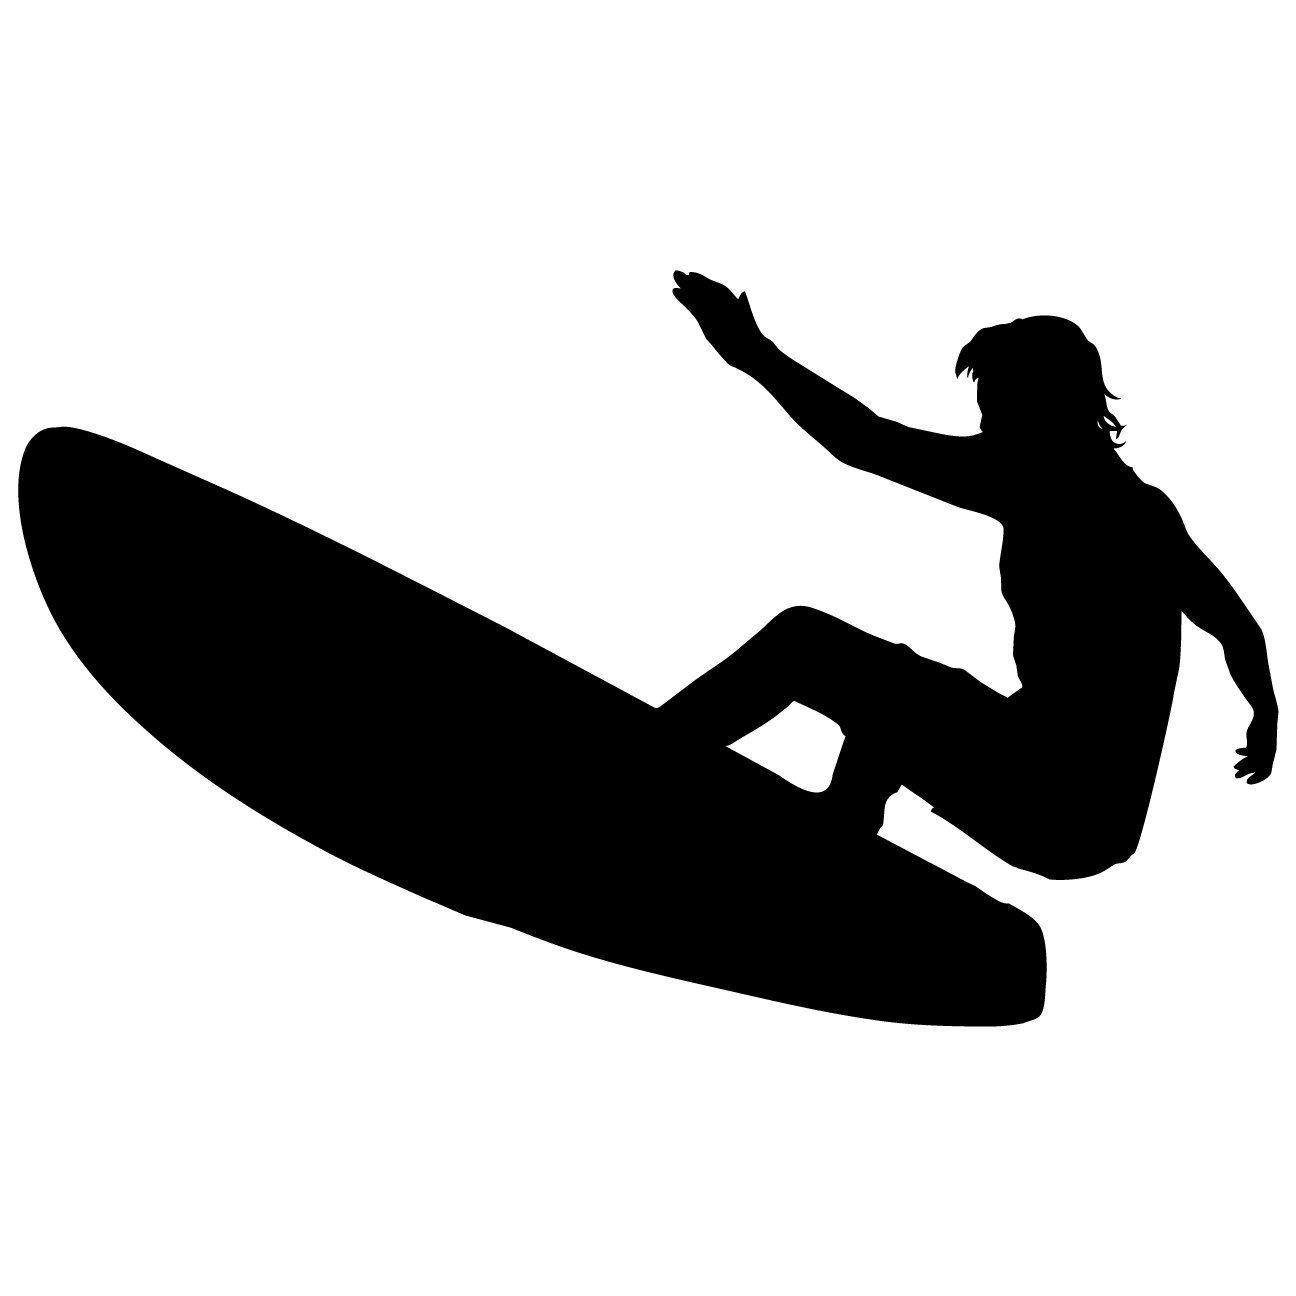 SURFER Boys Bedoom Kids Sports Wall Art Decal